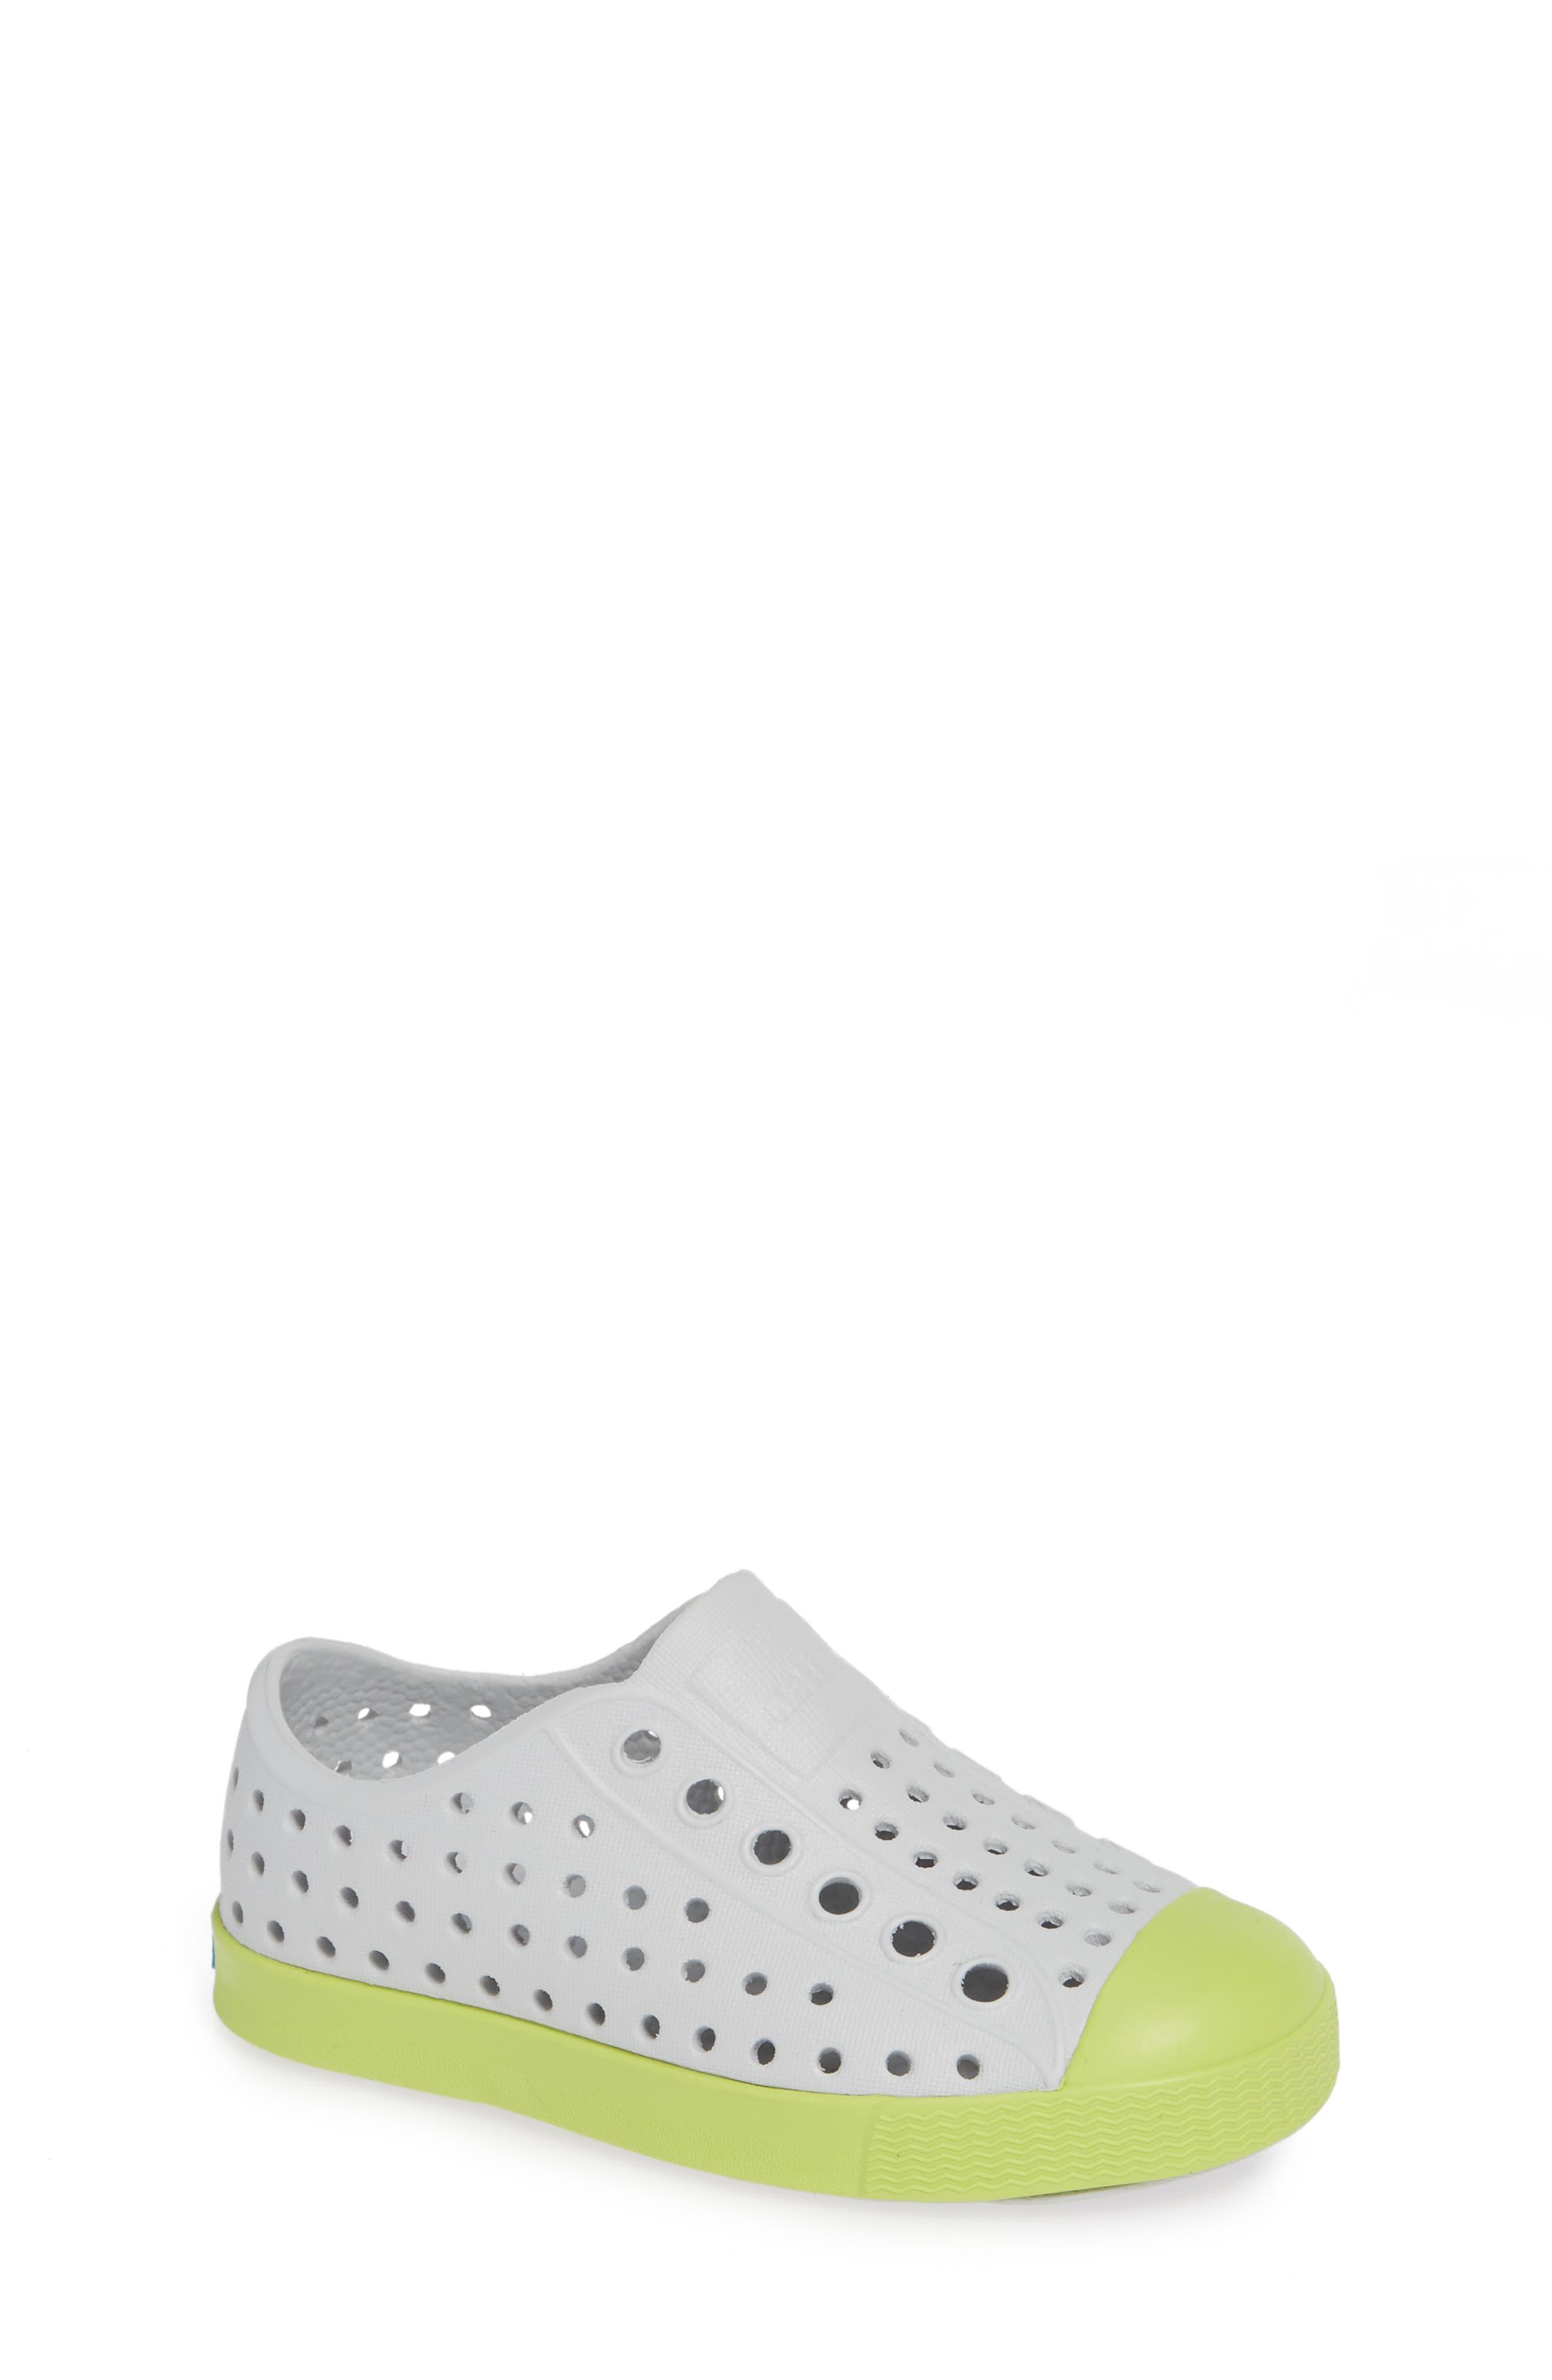 'Jefferson' Water Friendly Slip-On Sneaker,                             Main thumbnail 13, color,